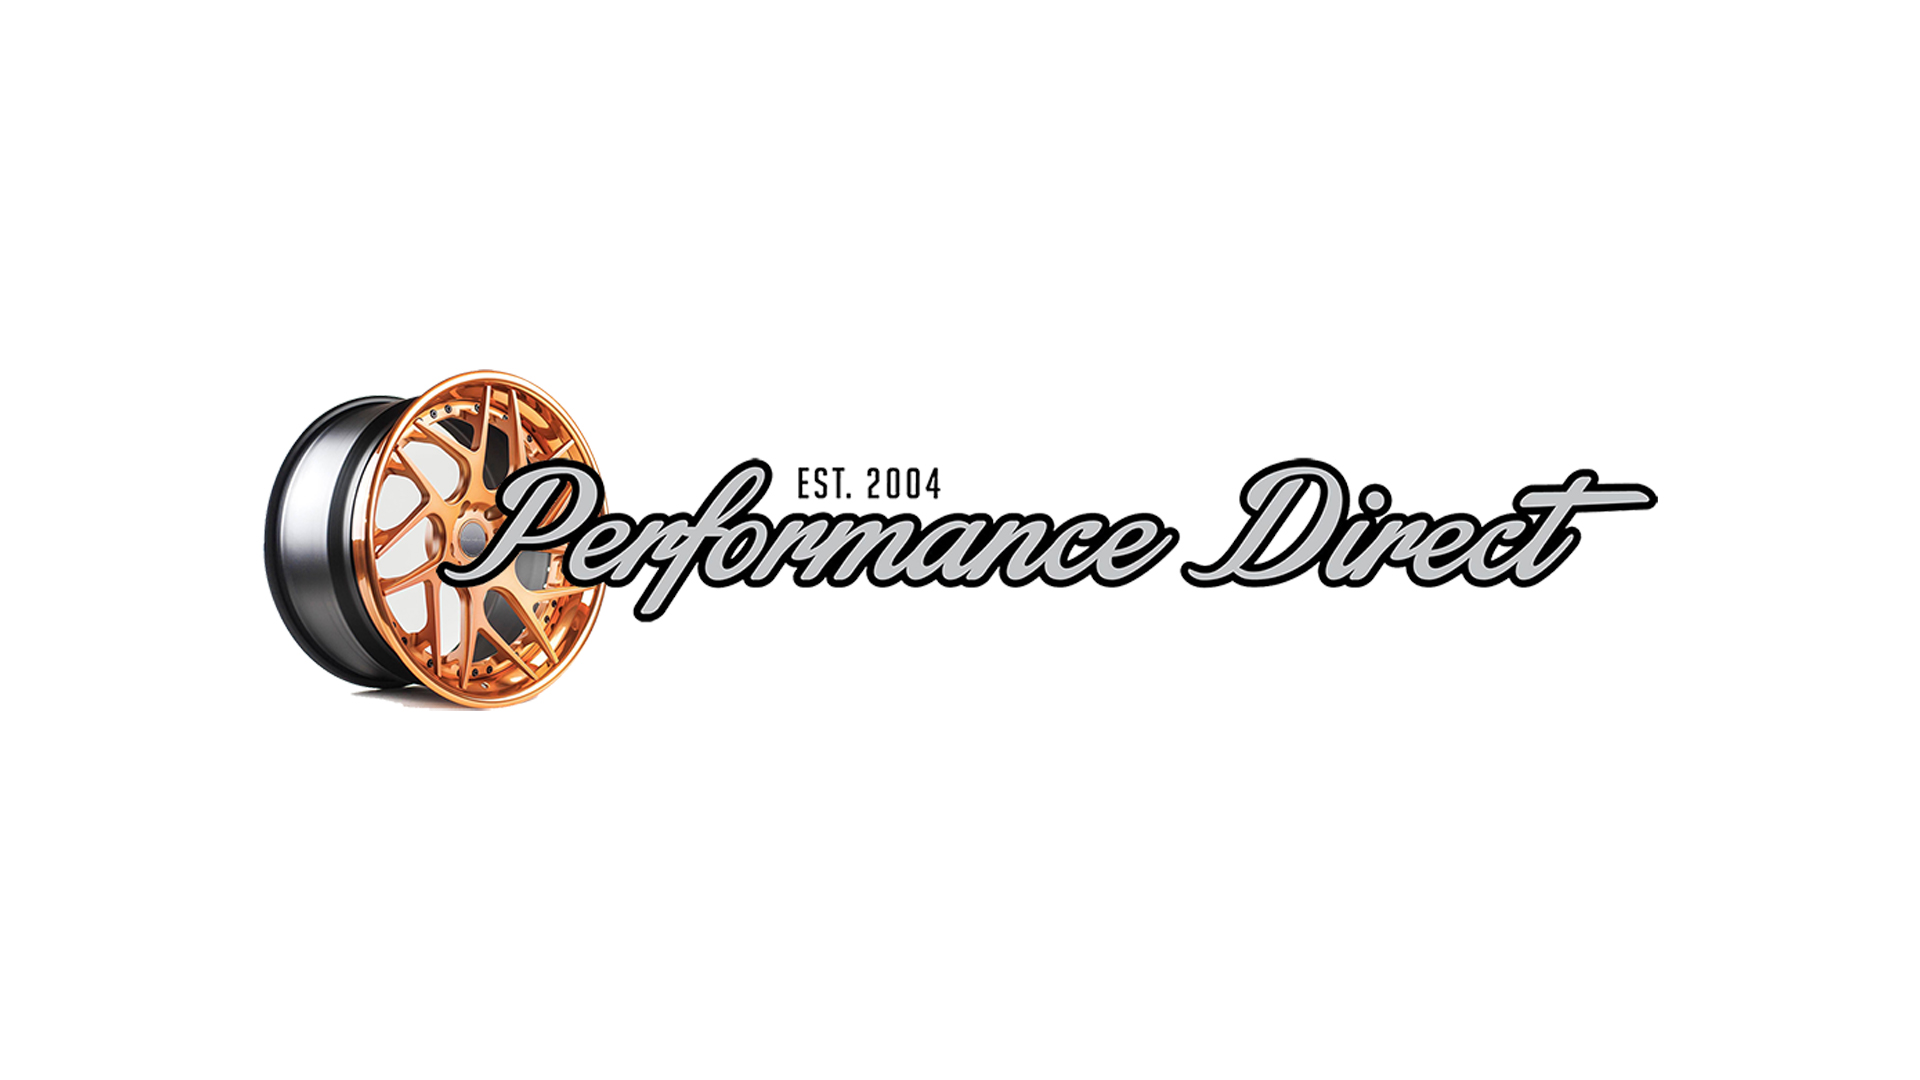 Performance Direct Barnsley